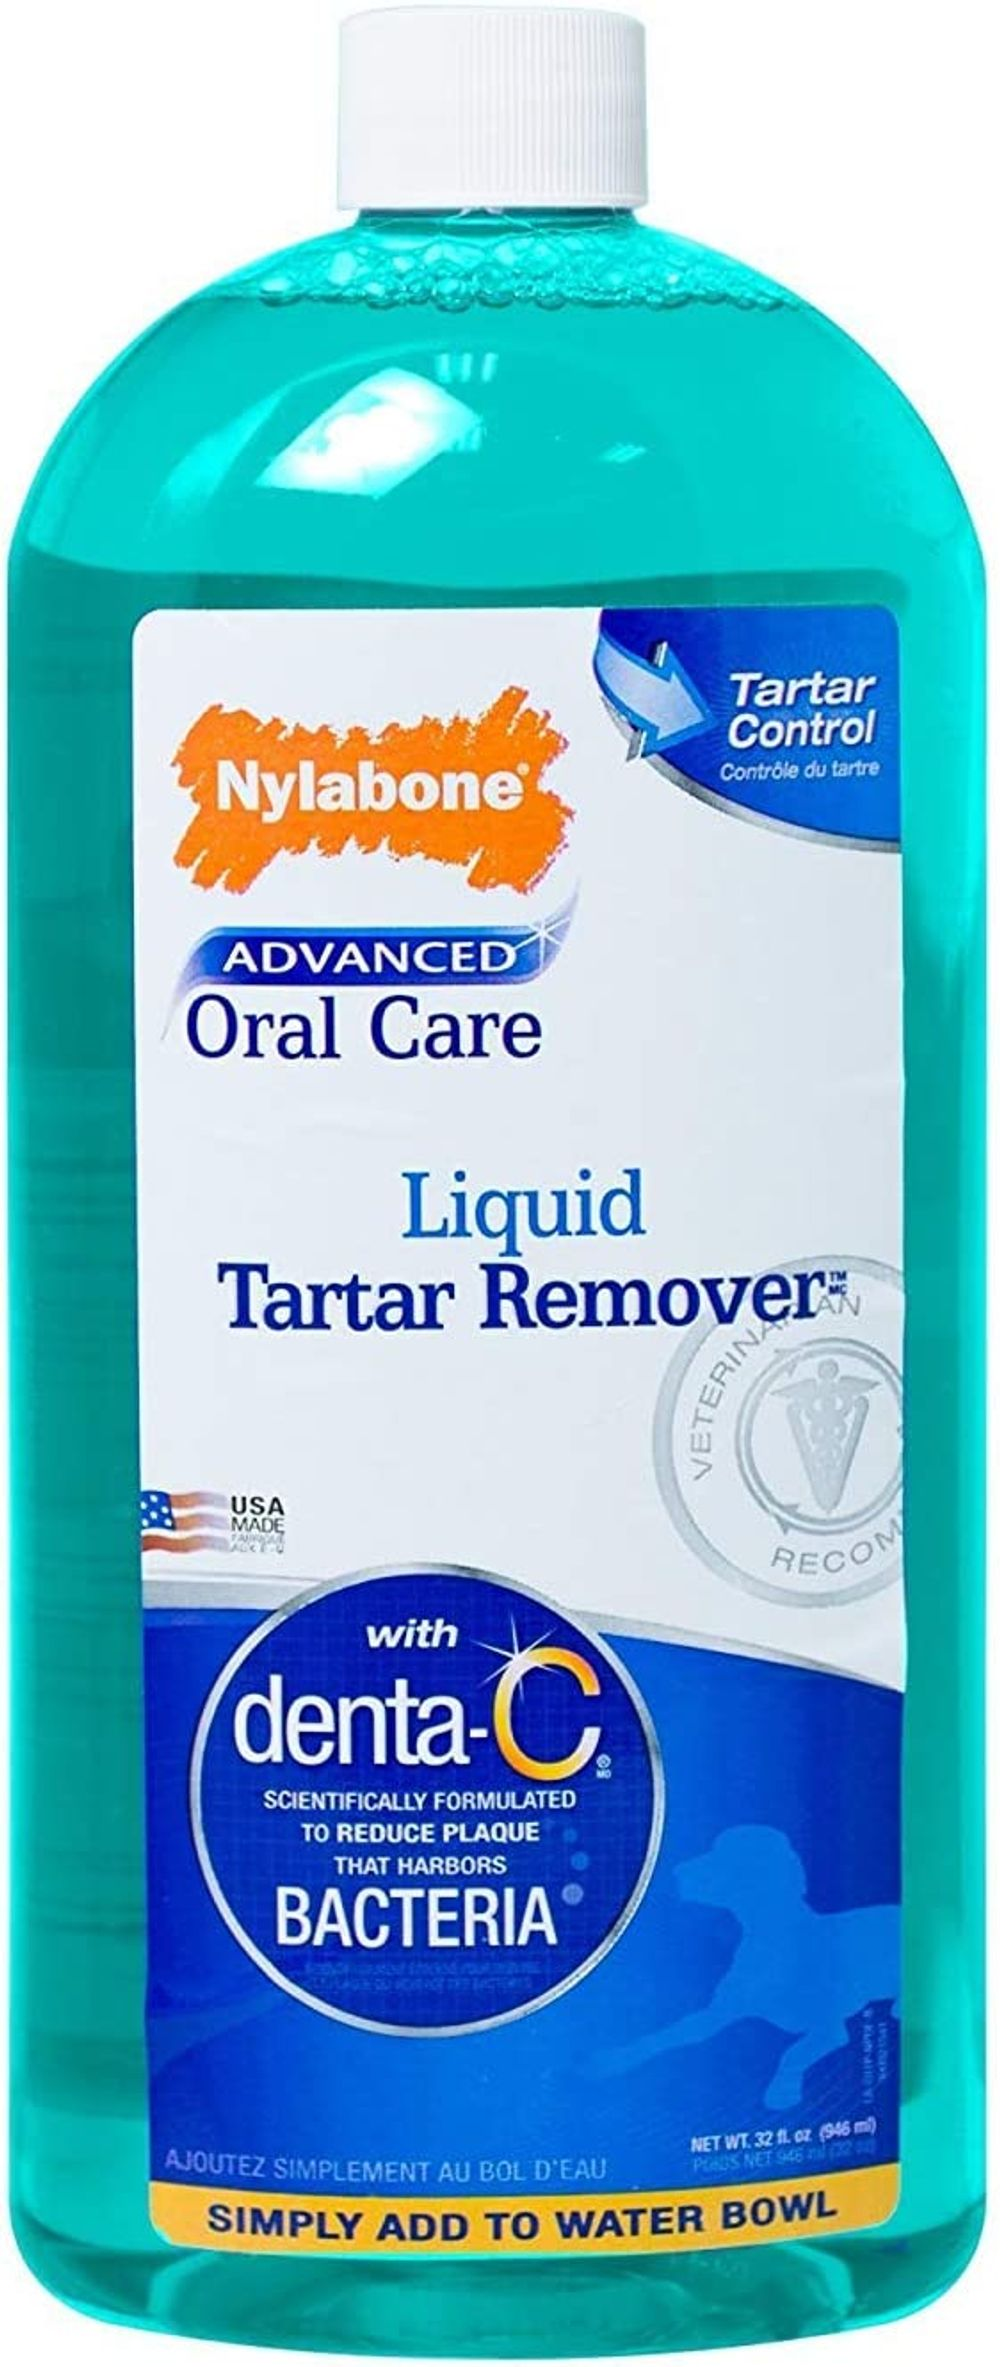 Nylabone Advanced Oral Care Liquid Tartar Remover